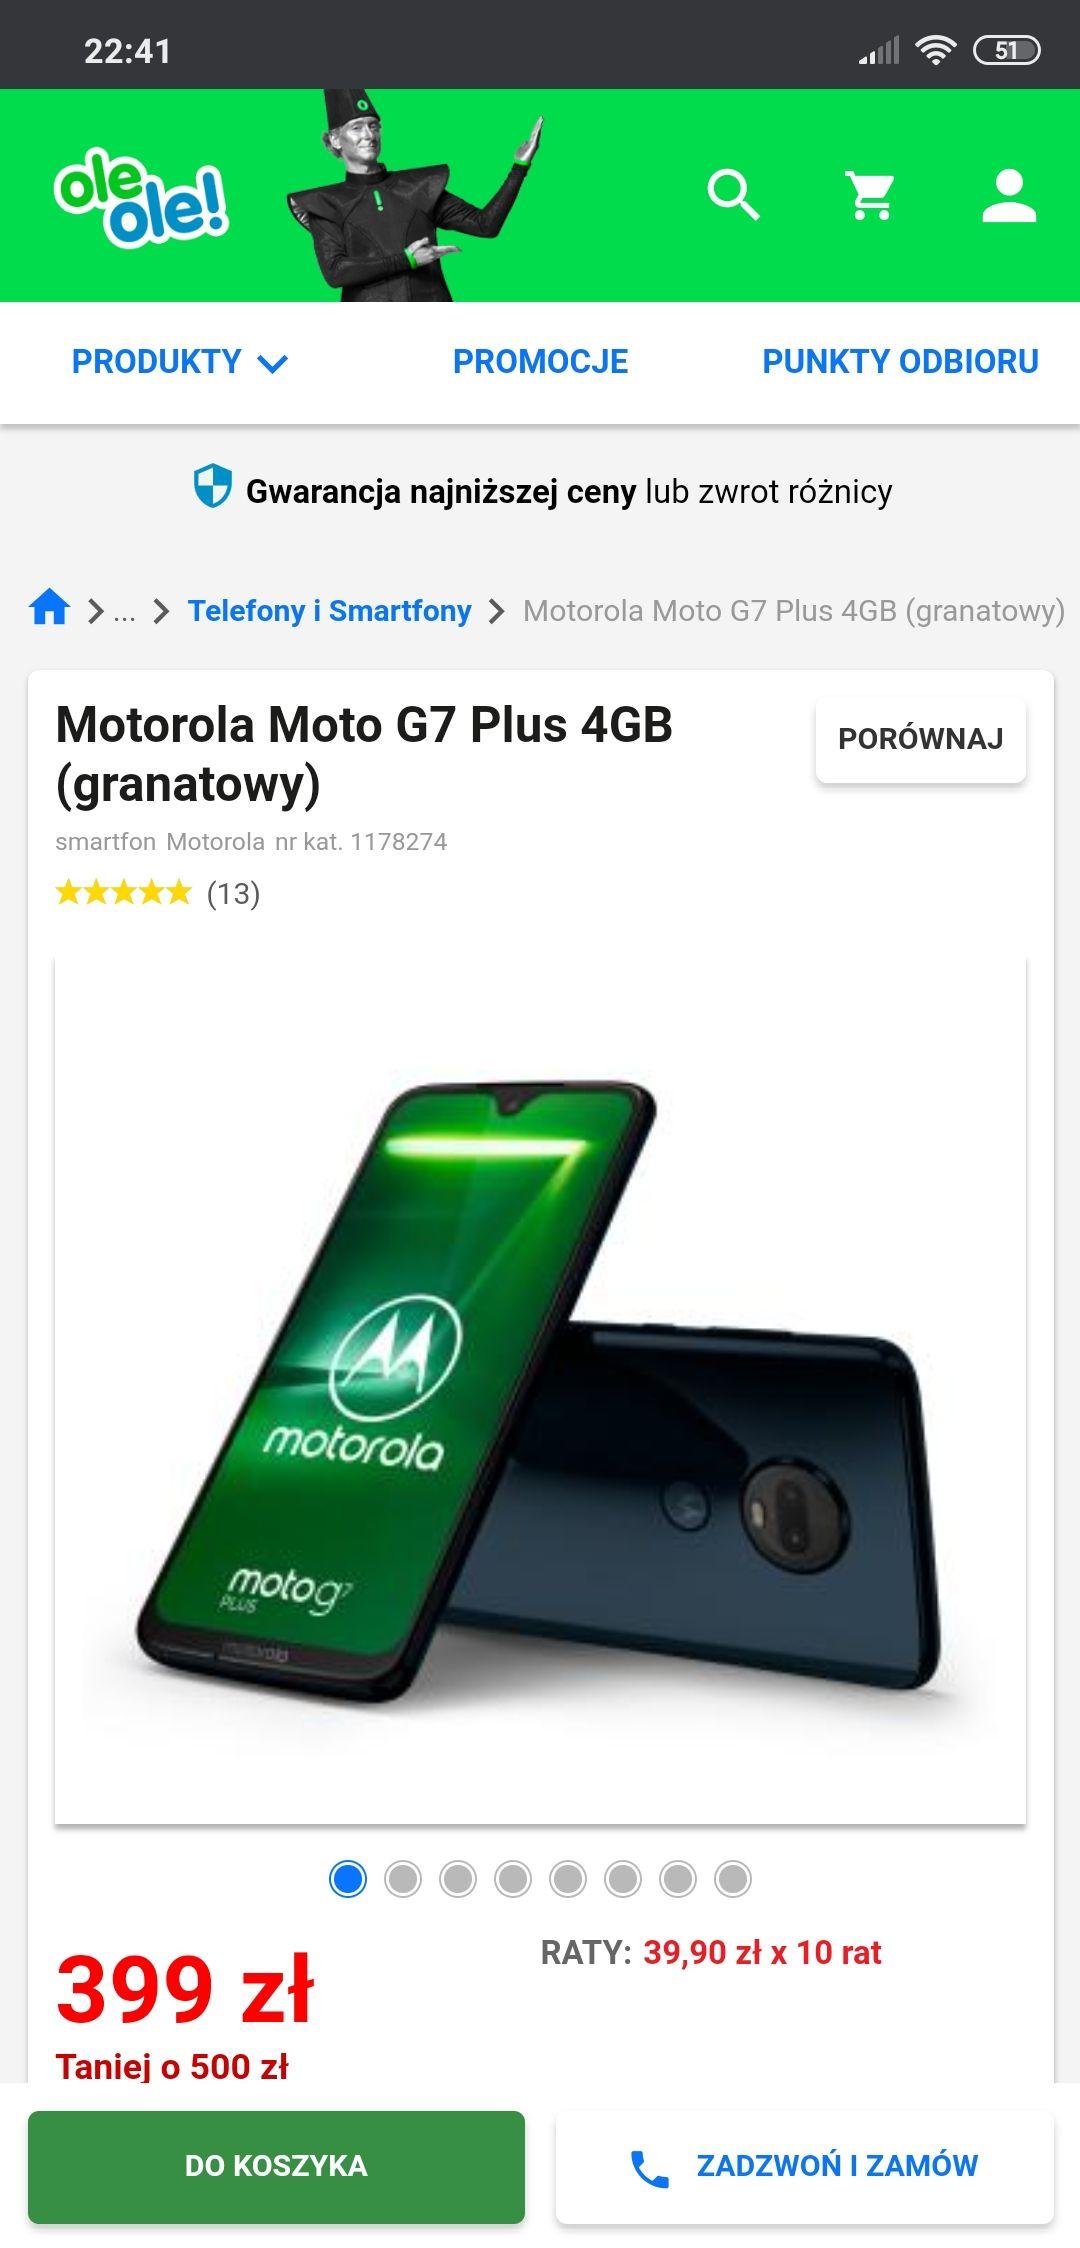 Motorola Moto g7 plus oleole